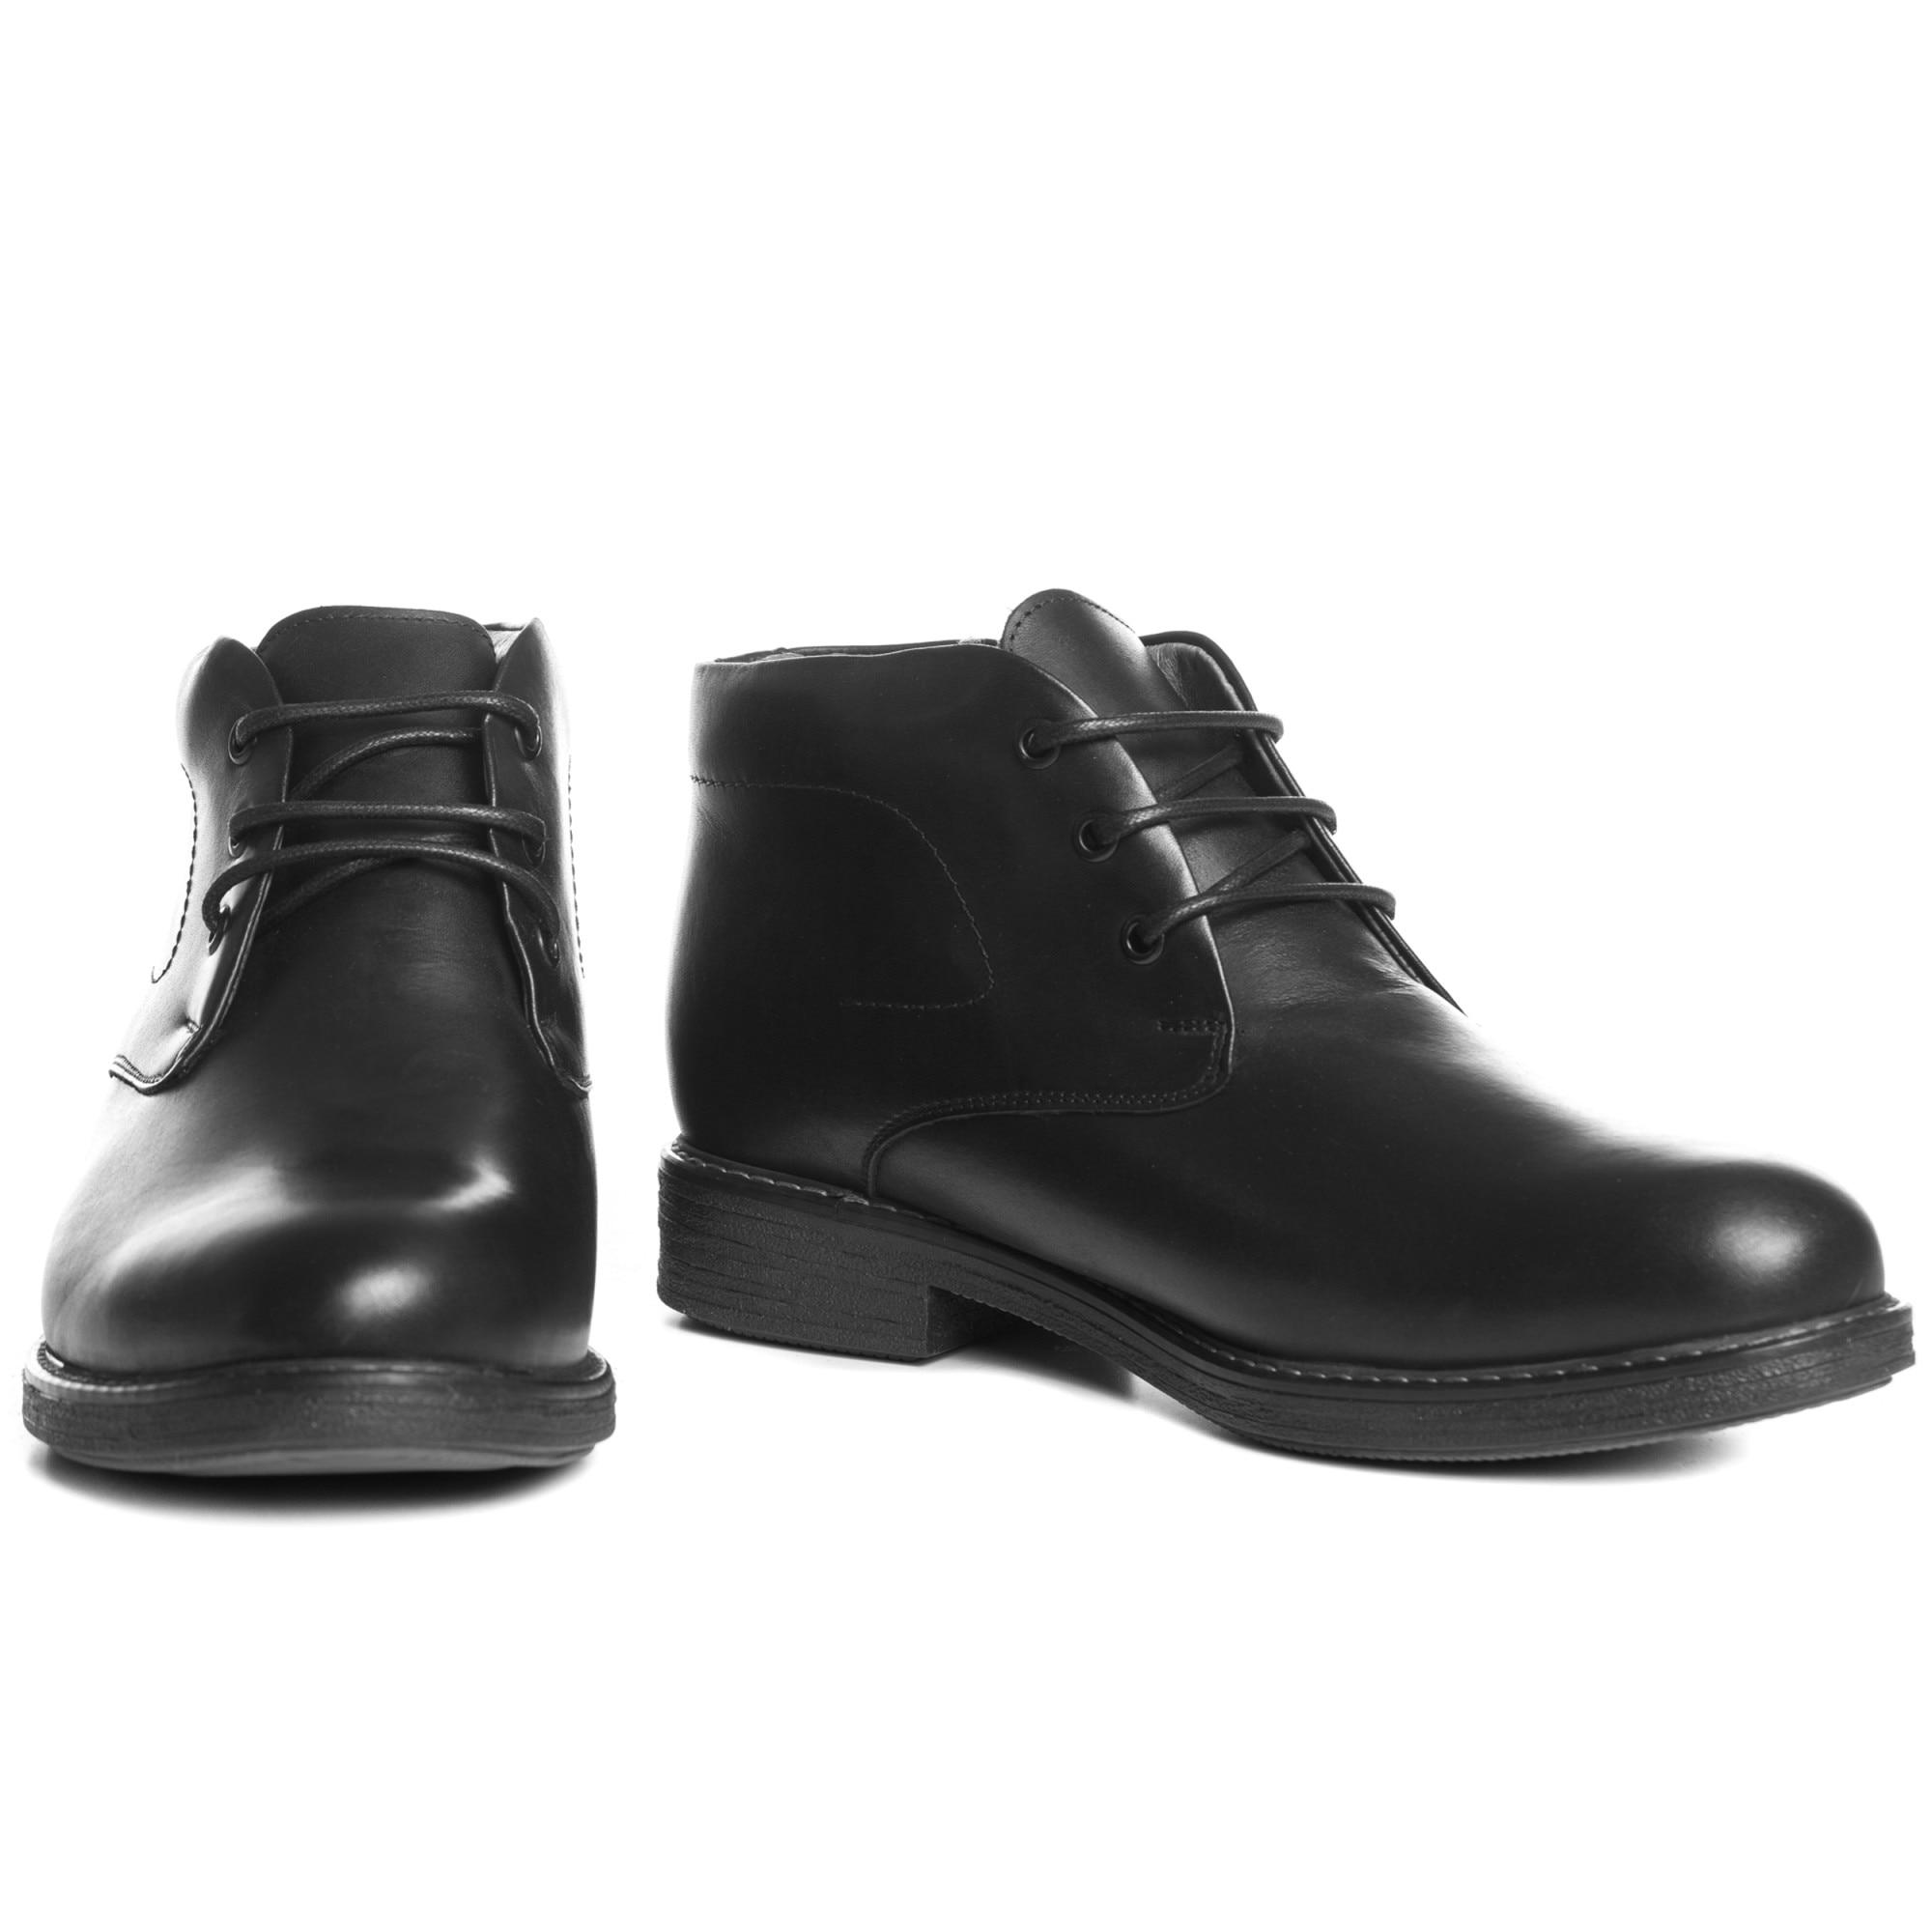 Fekete Férfi Elegáns Inocencio Csizma Fashionzona 704828